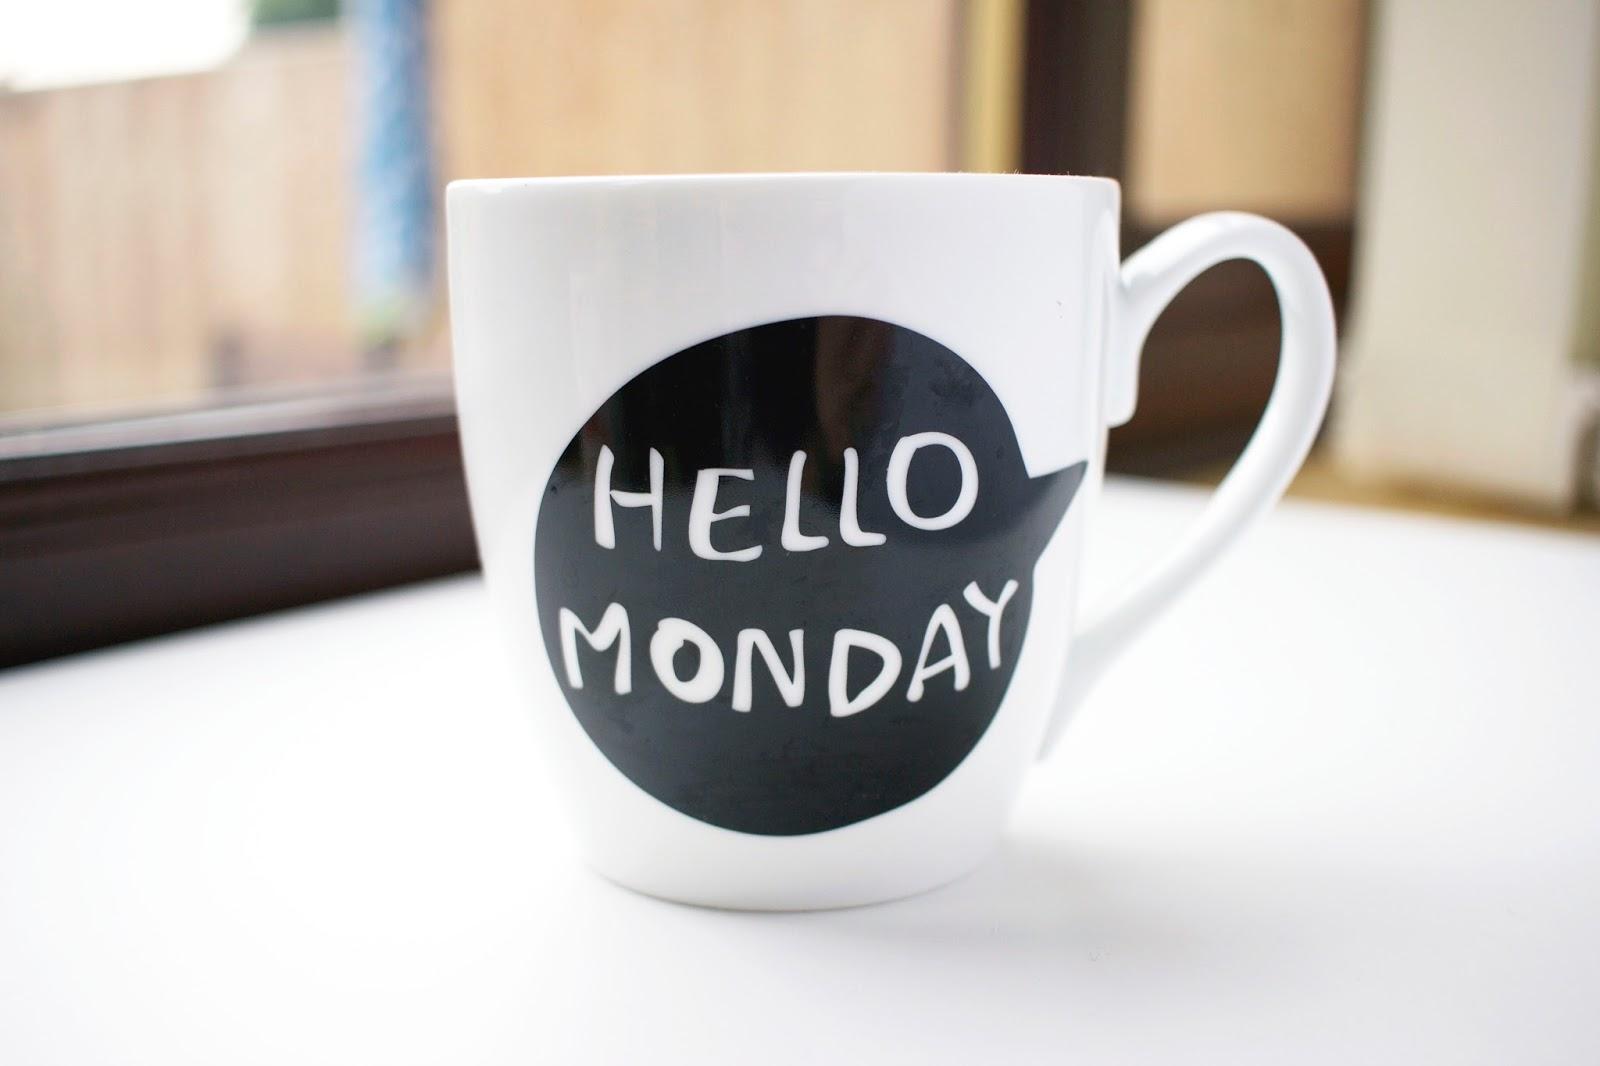 Hello Monday, Summer Goals, Summer Holiday, Lifestyle blog, Goals, Positivity, Life, Monday, Monday mug, Hello Monday Mug, Primark,